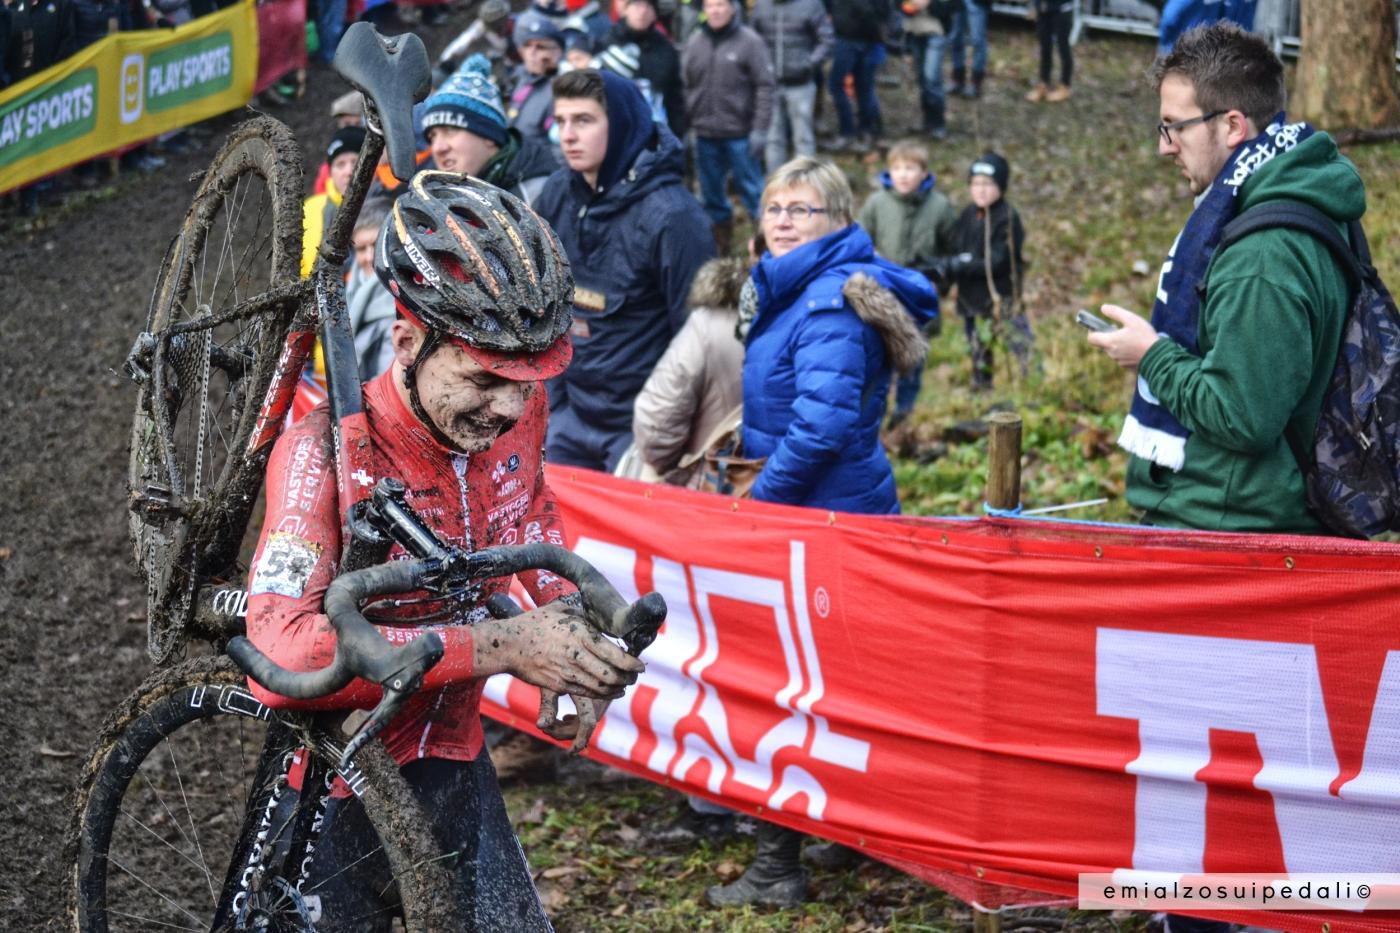 foto Namur Ciclocross Coppa del Mondo